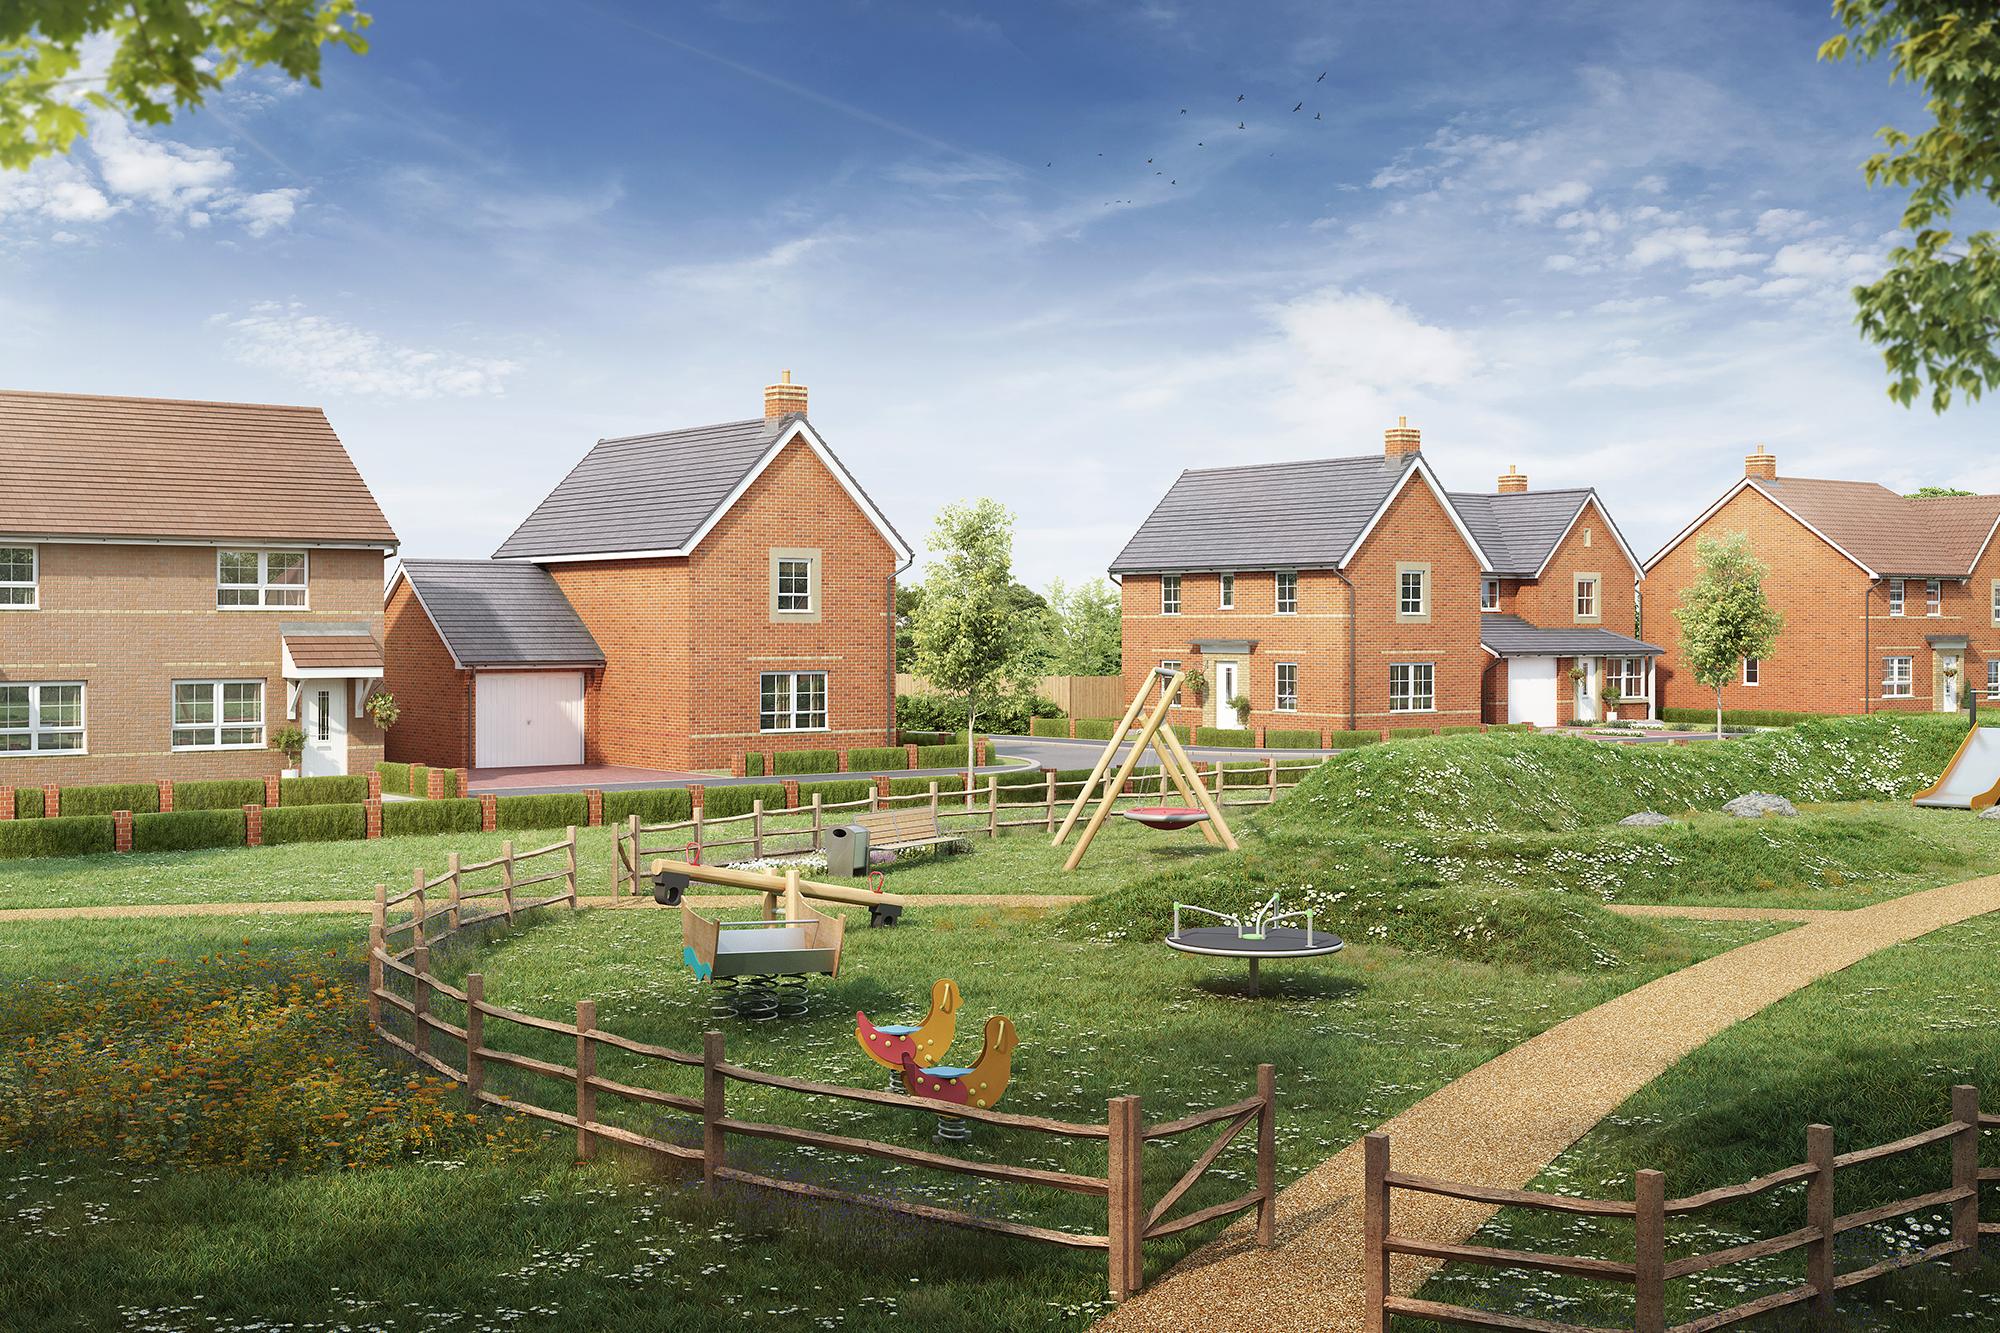 New Build Homes in Westhampnett